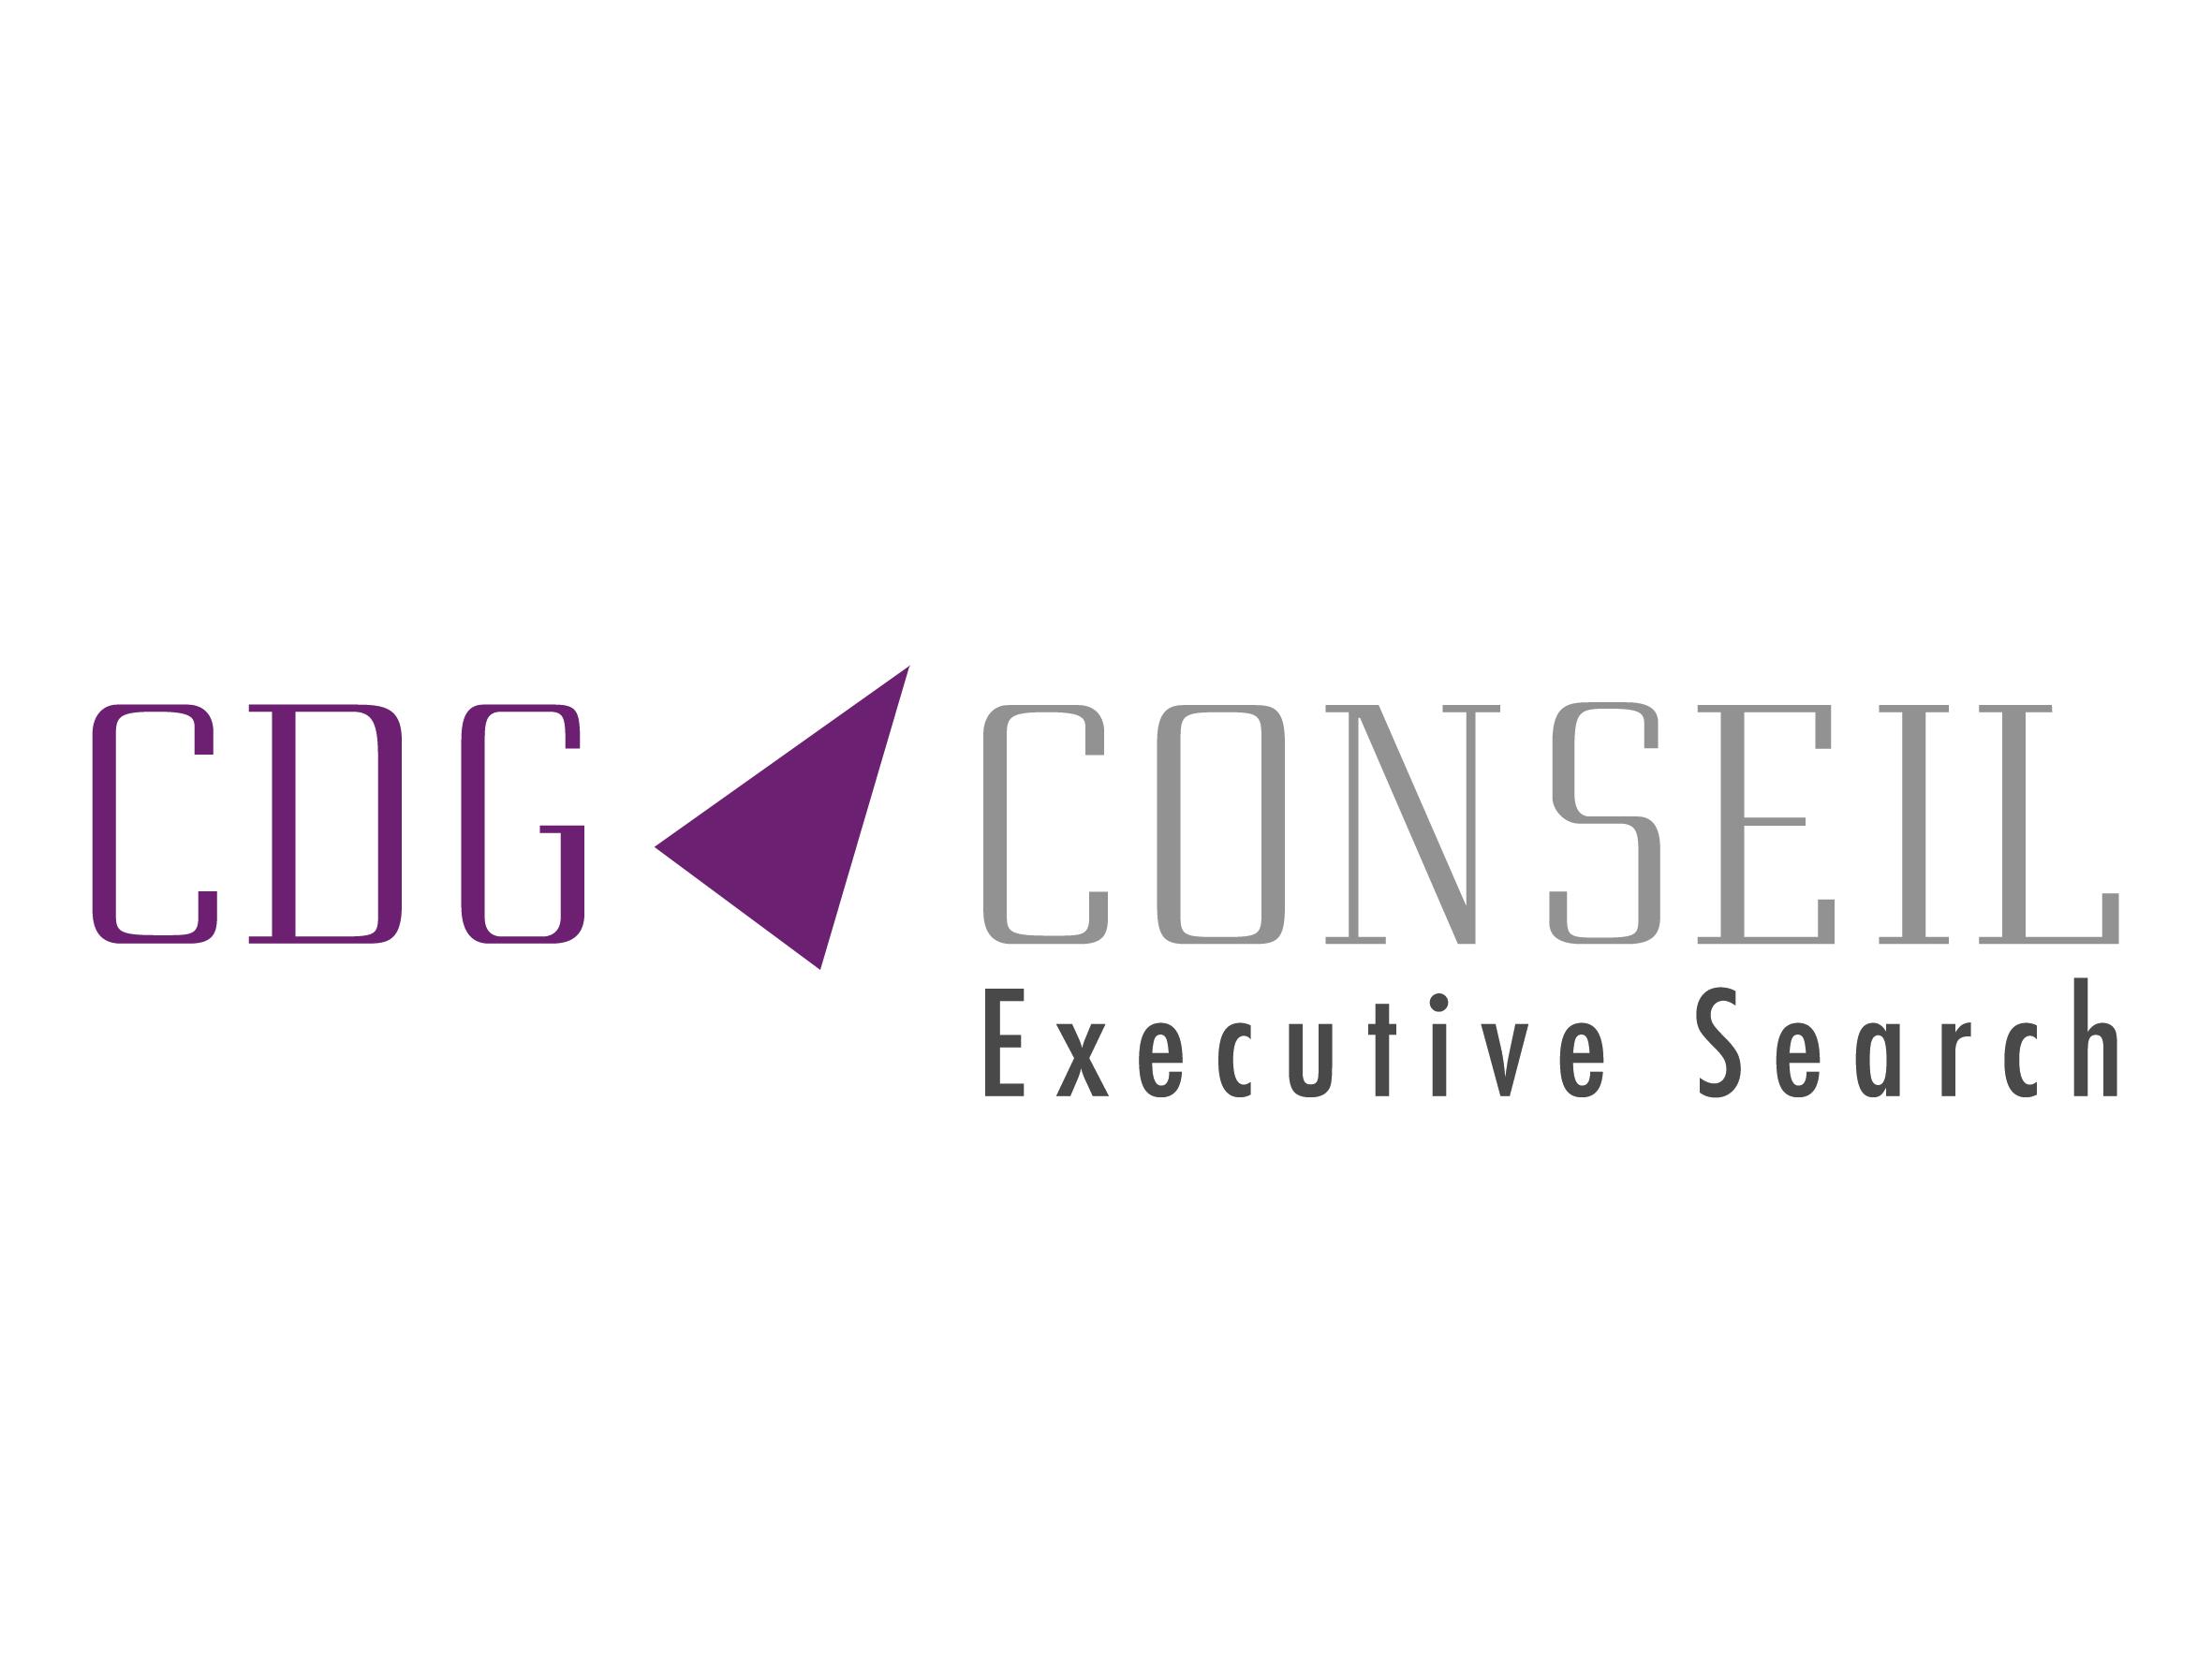 CDG CONSEIL